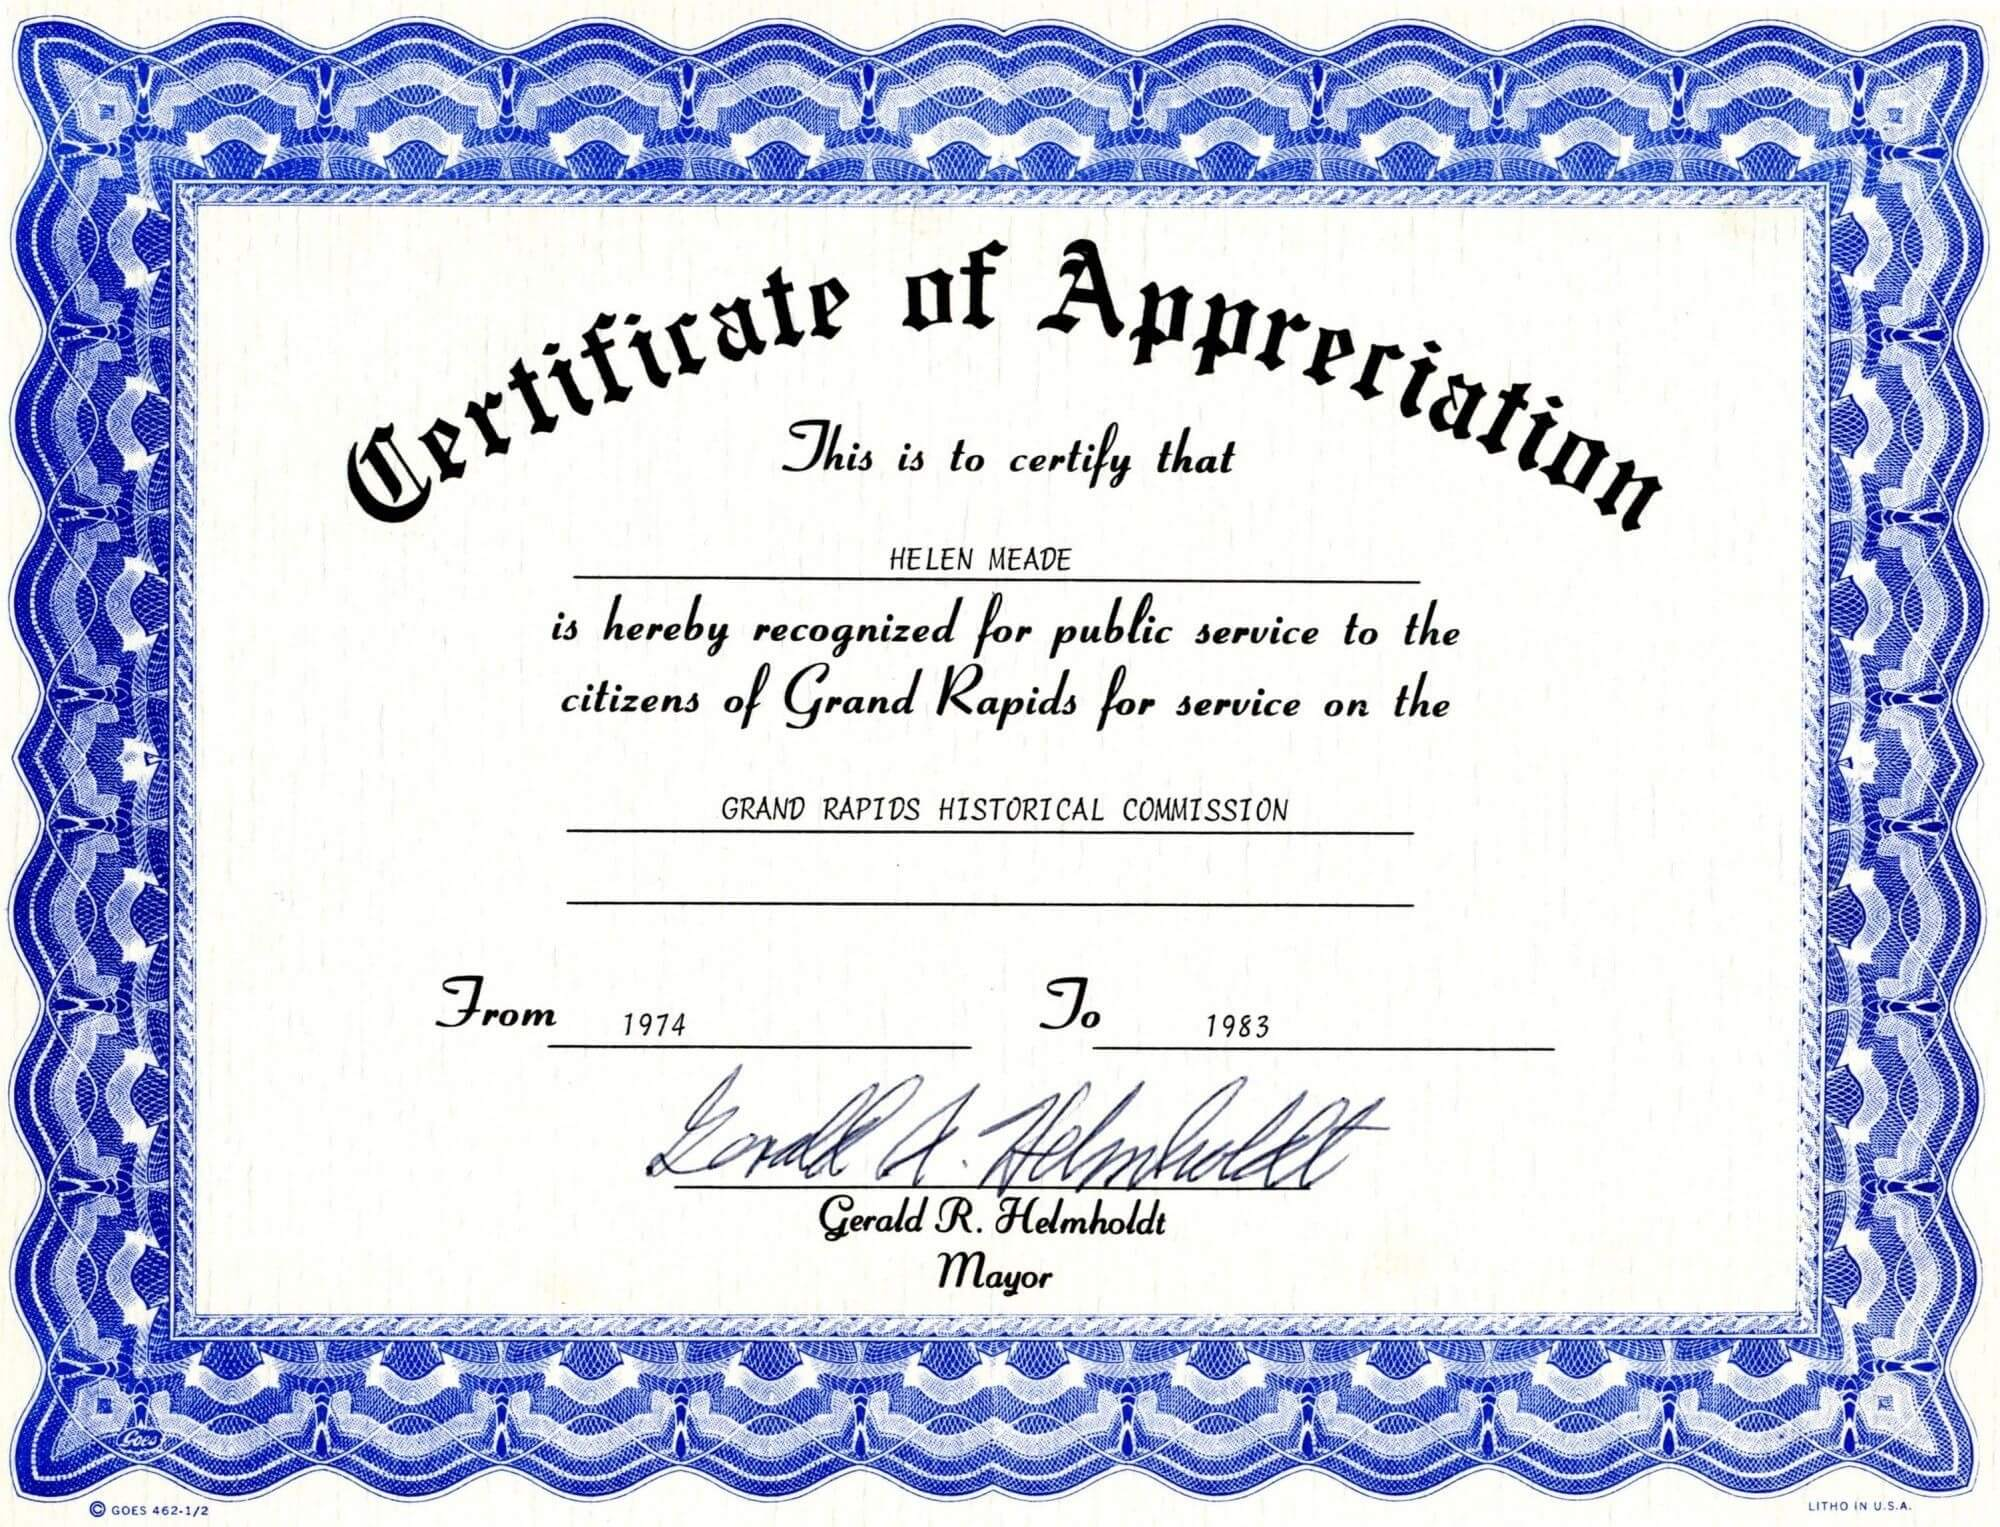 Appreciation Certificate Templates Free Download Pertaining To Free Certificate Of Appreciation Template Downloads